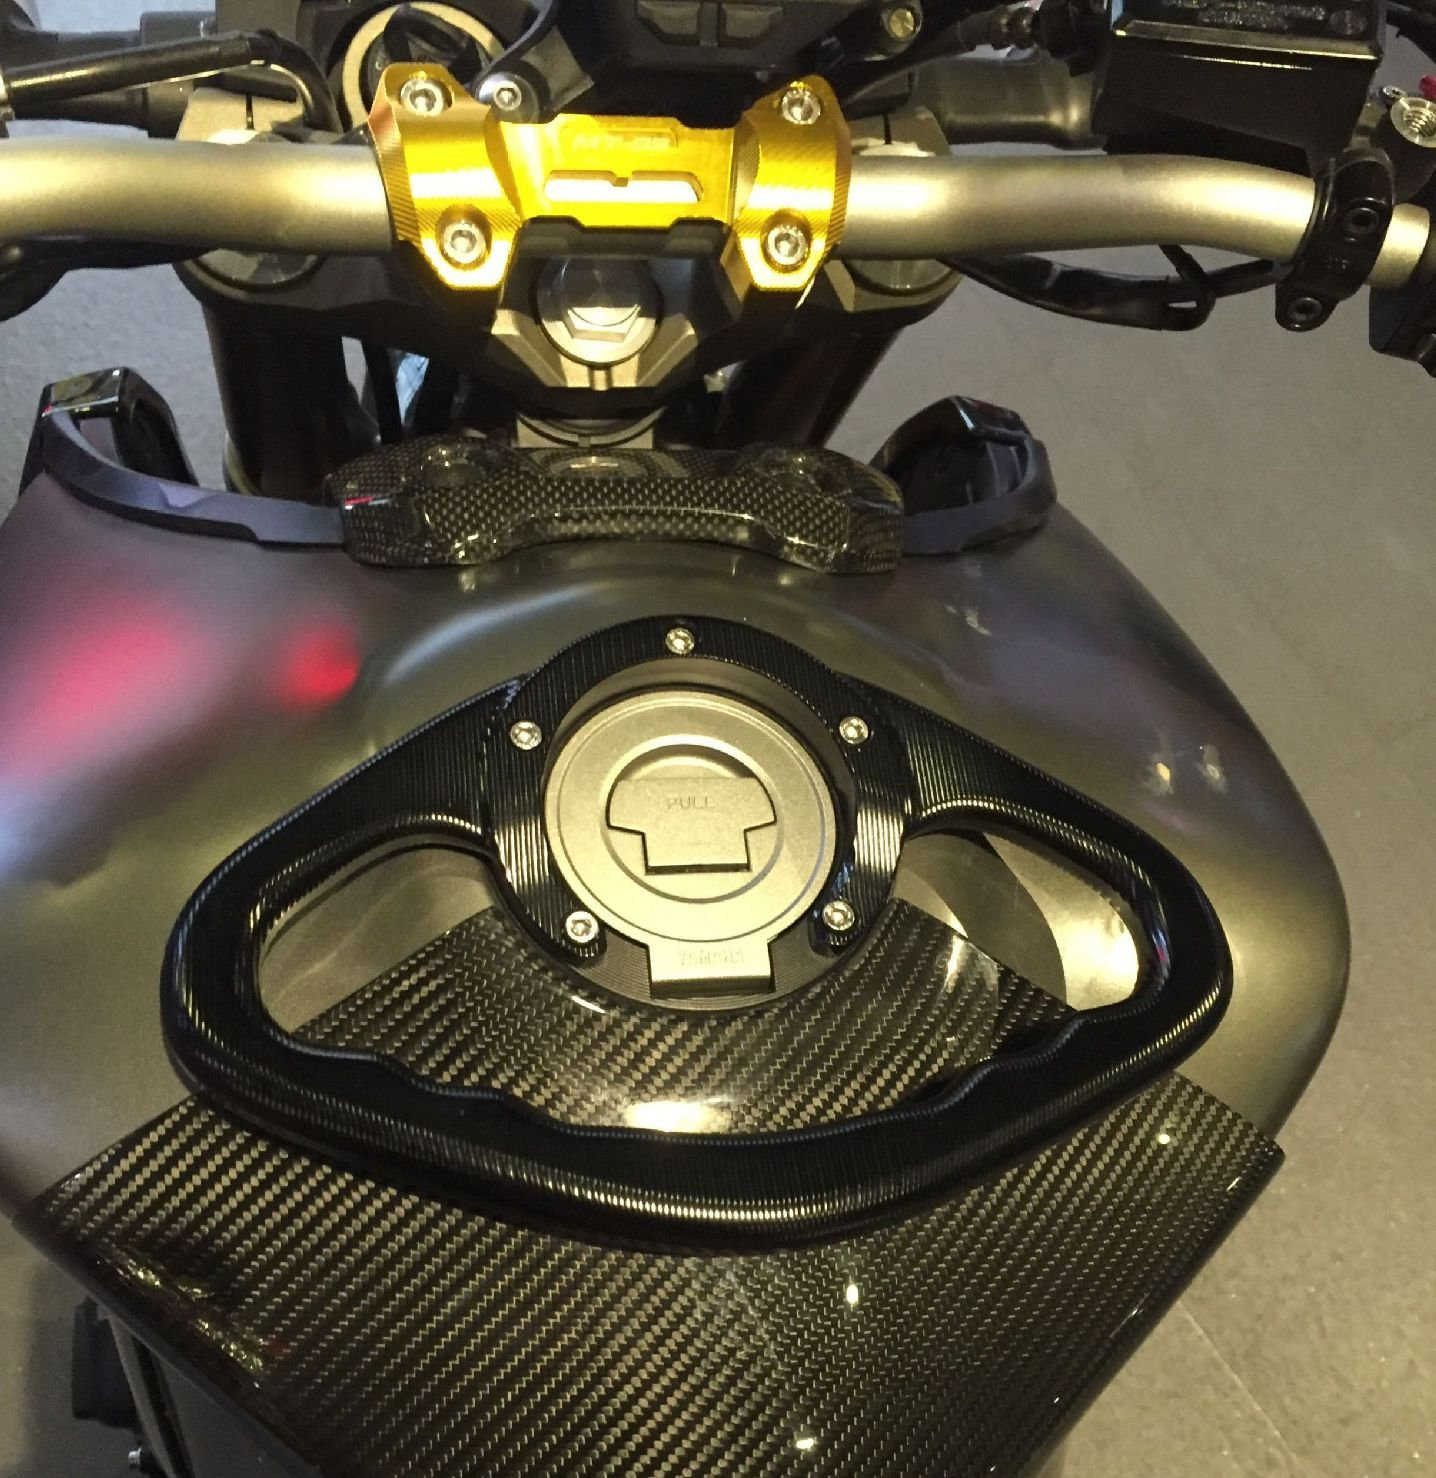 Ocamo Passager Poign/ée R/éservoir Barre dappui Poign/ées Accoudoir pour Yamaha FZ1/FZ6/FZ8/XJ6